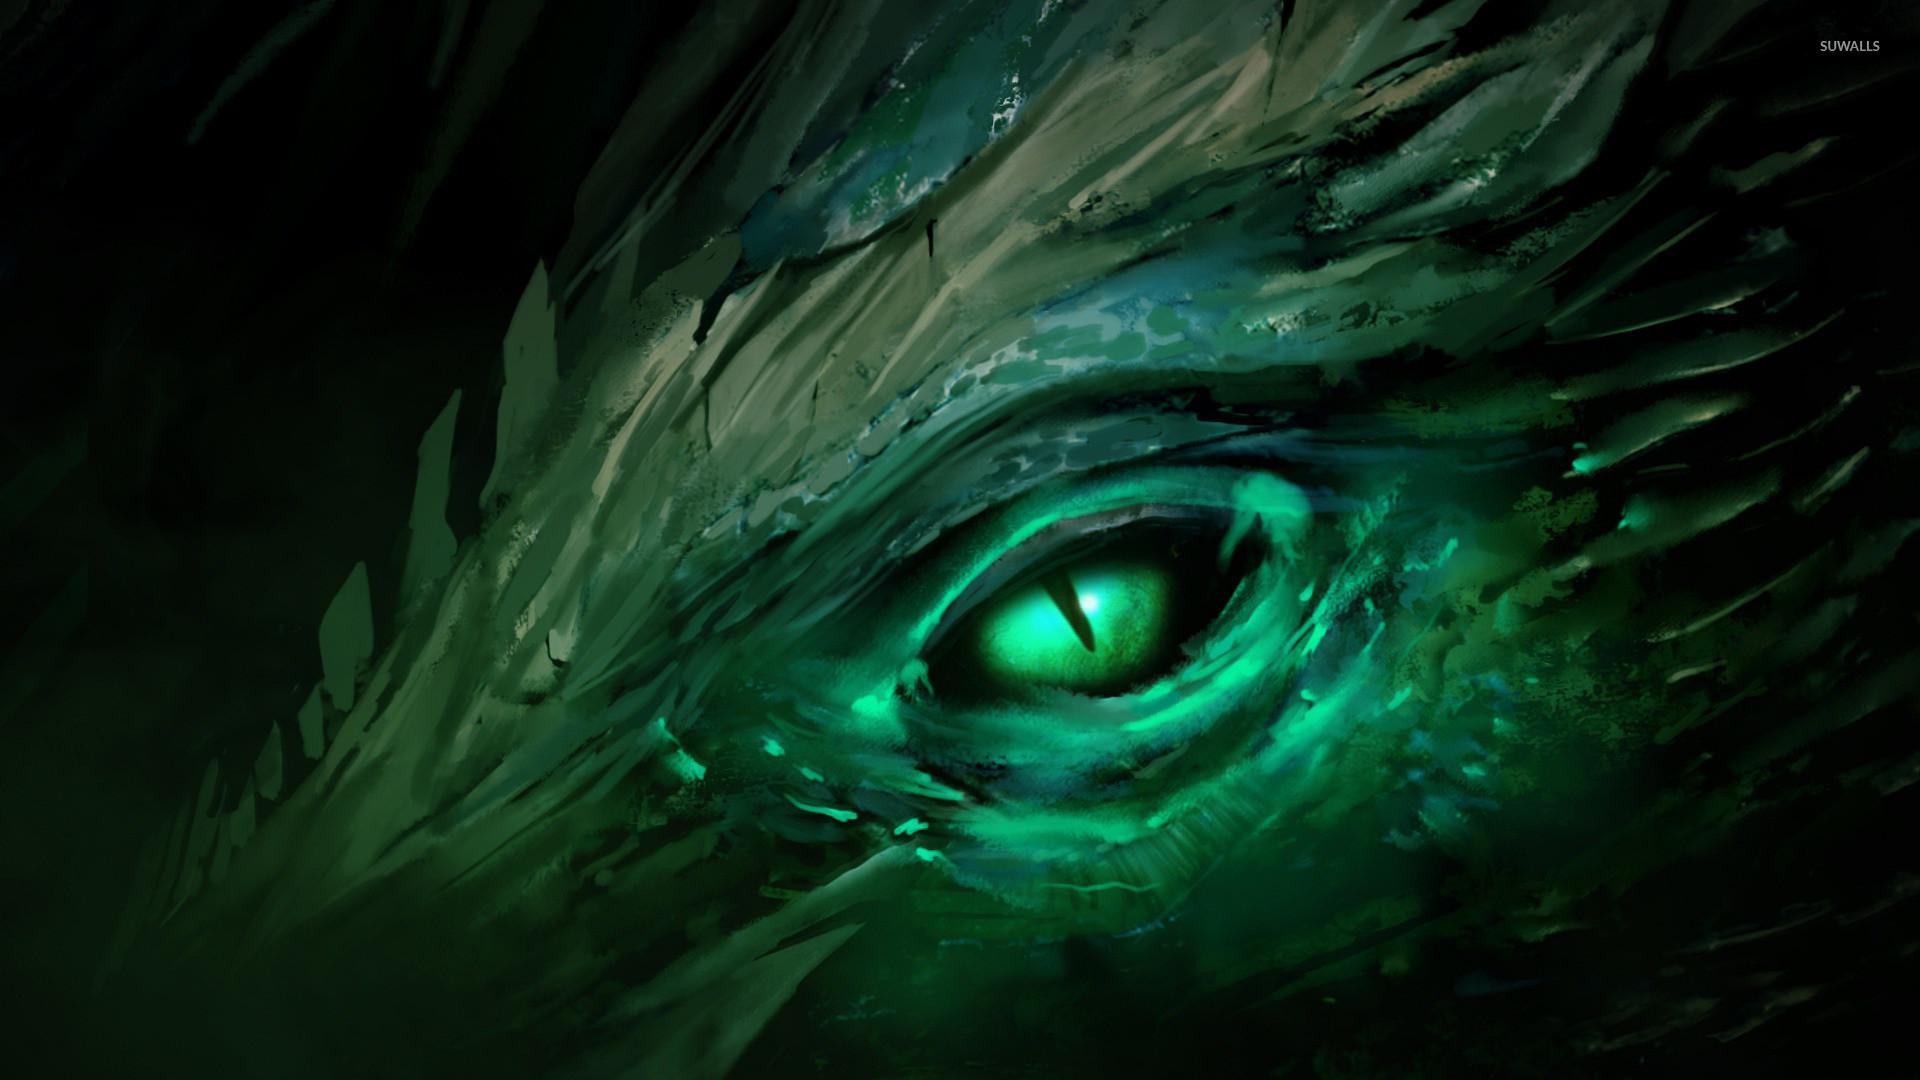 Full HD 1080p Dragon Wallpapers HD, Desktop Backgrounds .